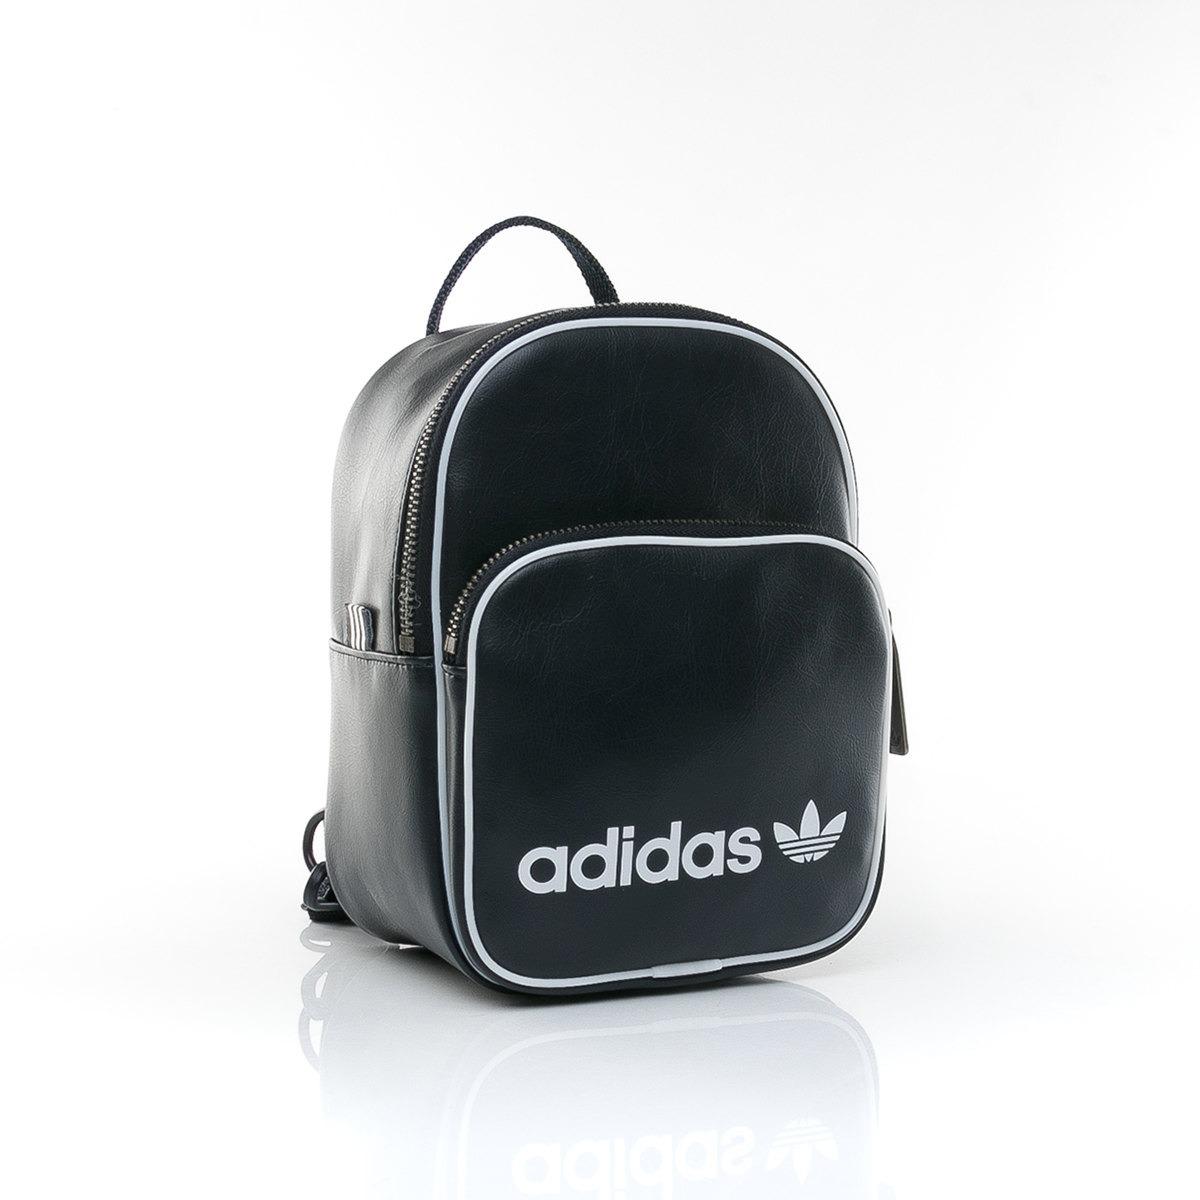 Blast Mochila Originals Mini Oficial Tienda Classic X Adidas mOvn0wyN8